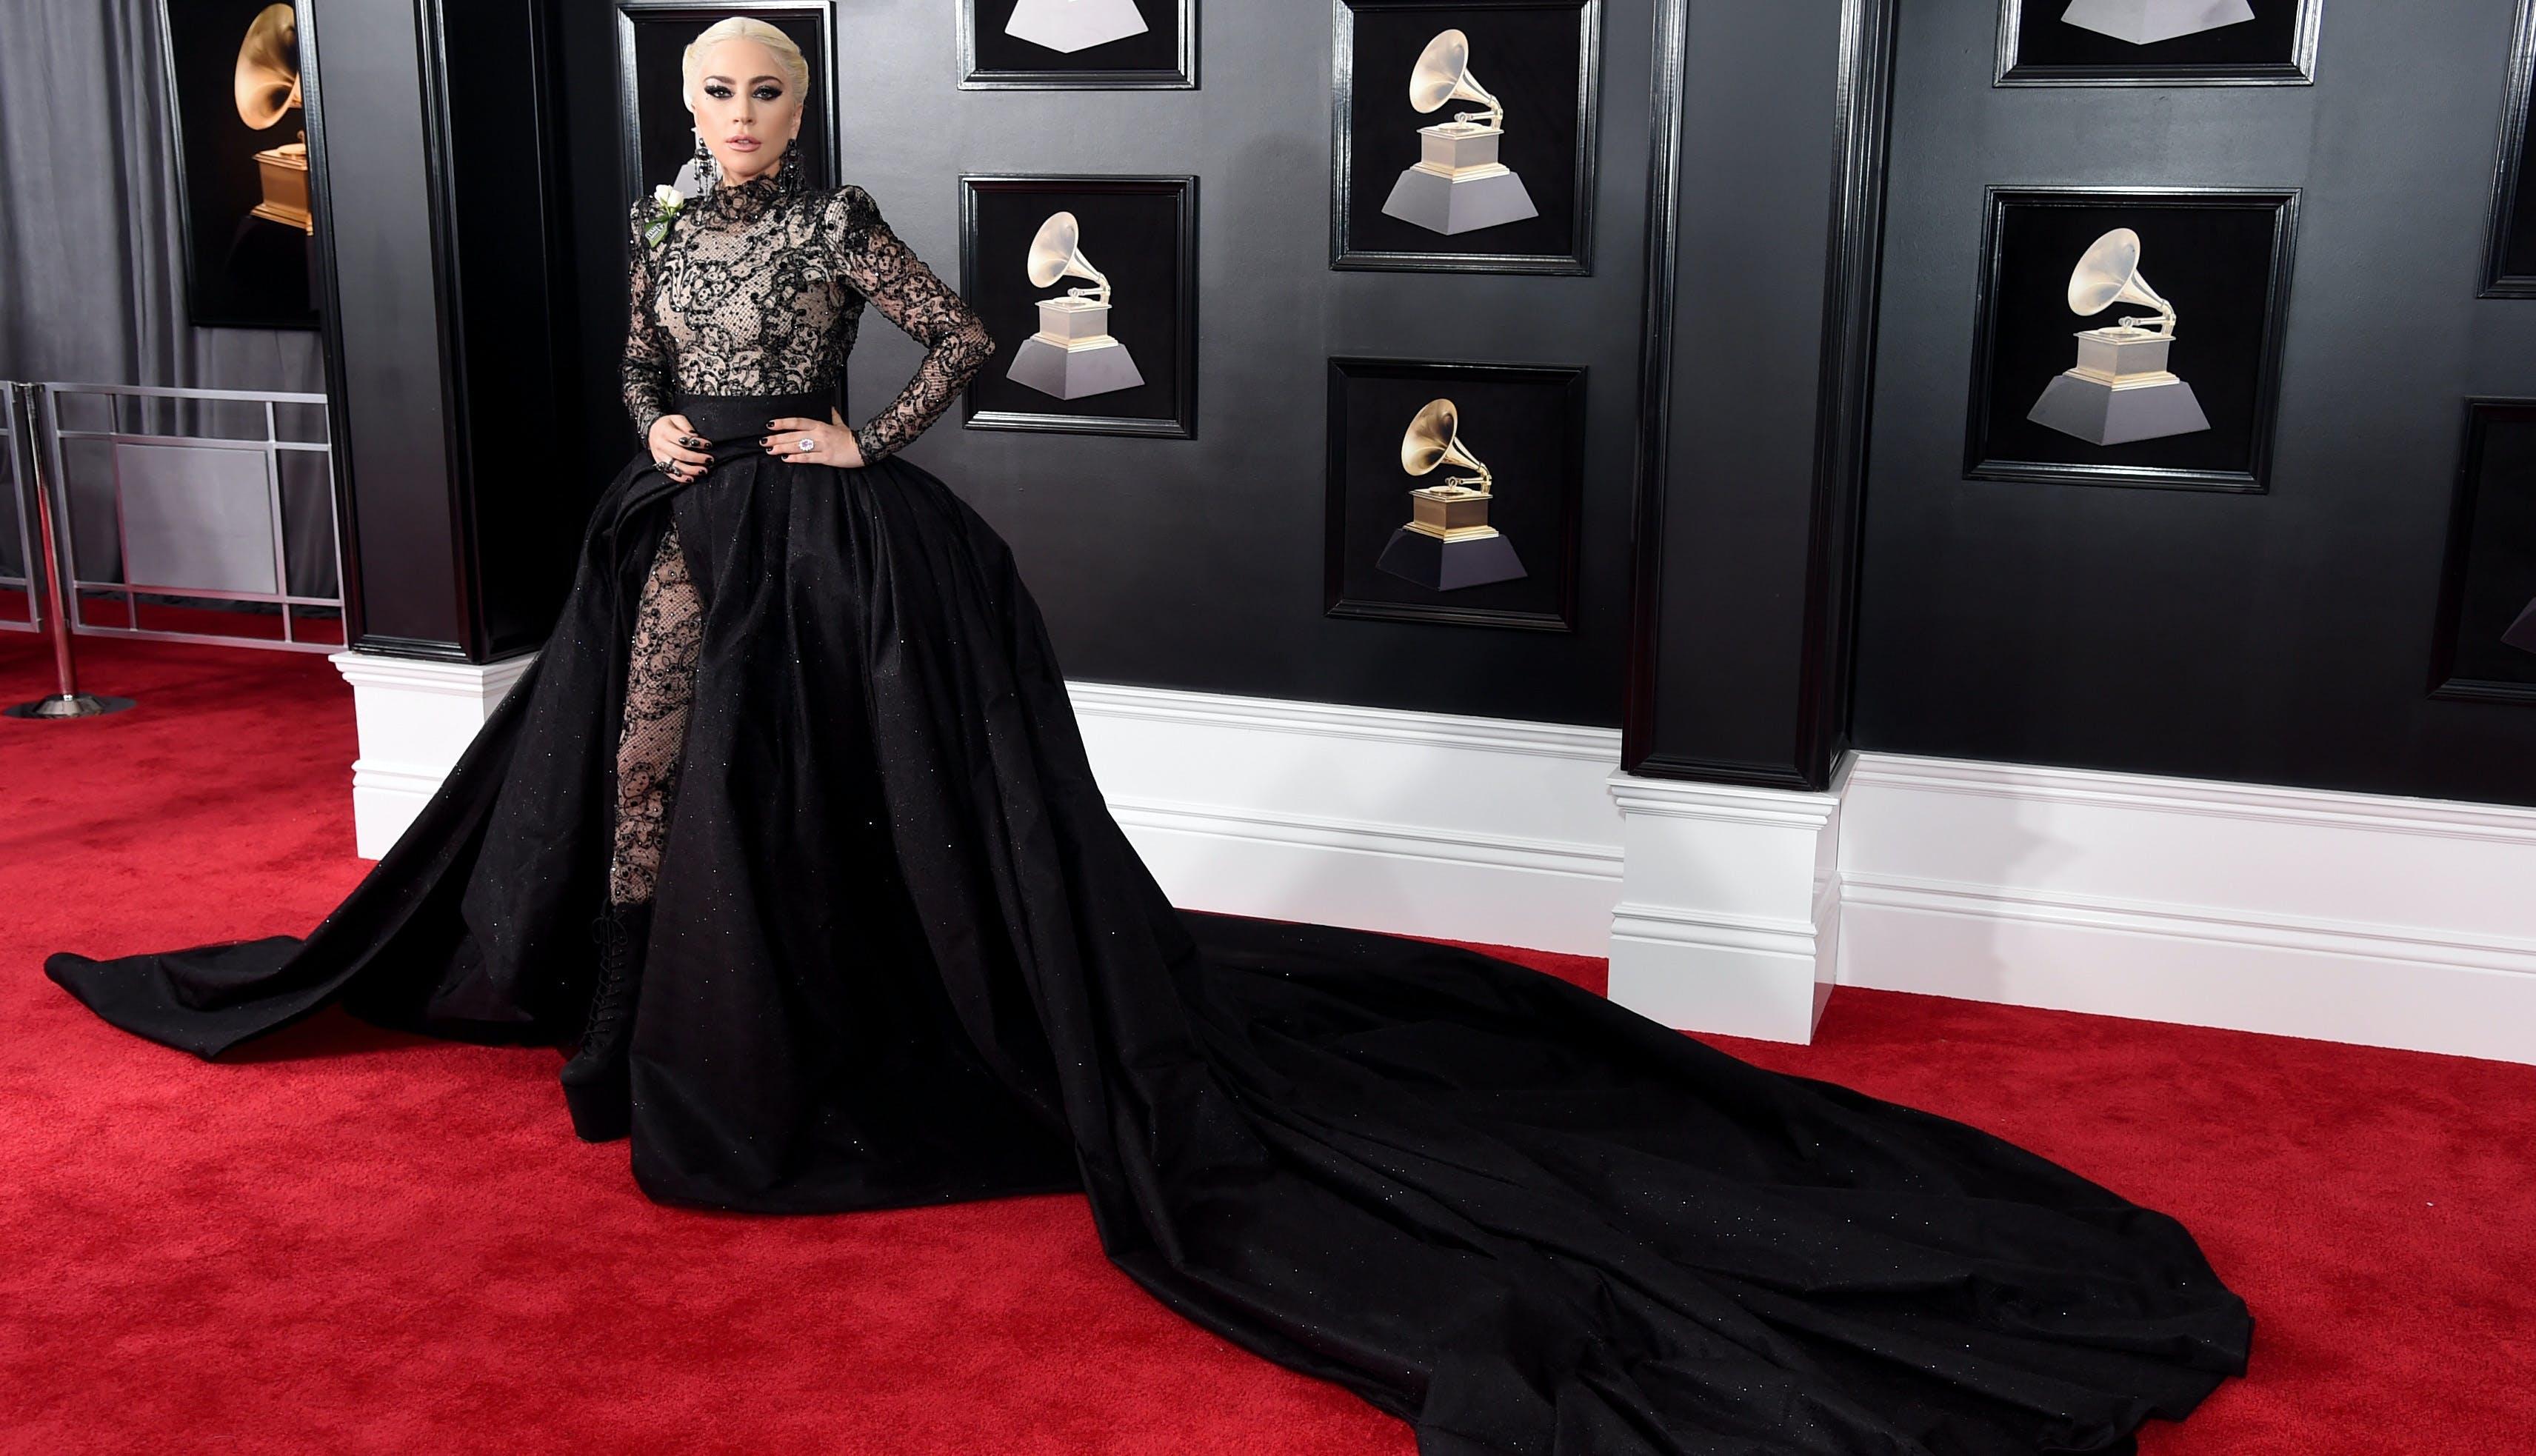 Lady Gaga Grammy awards red carpet look 1